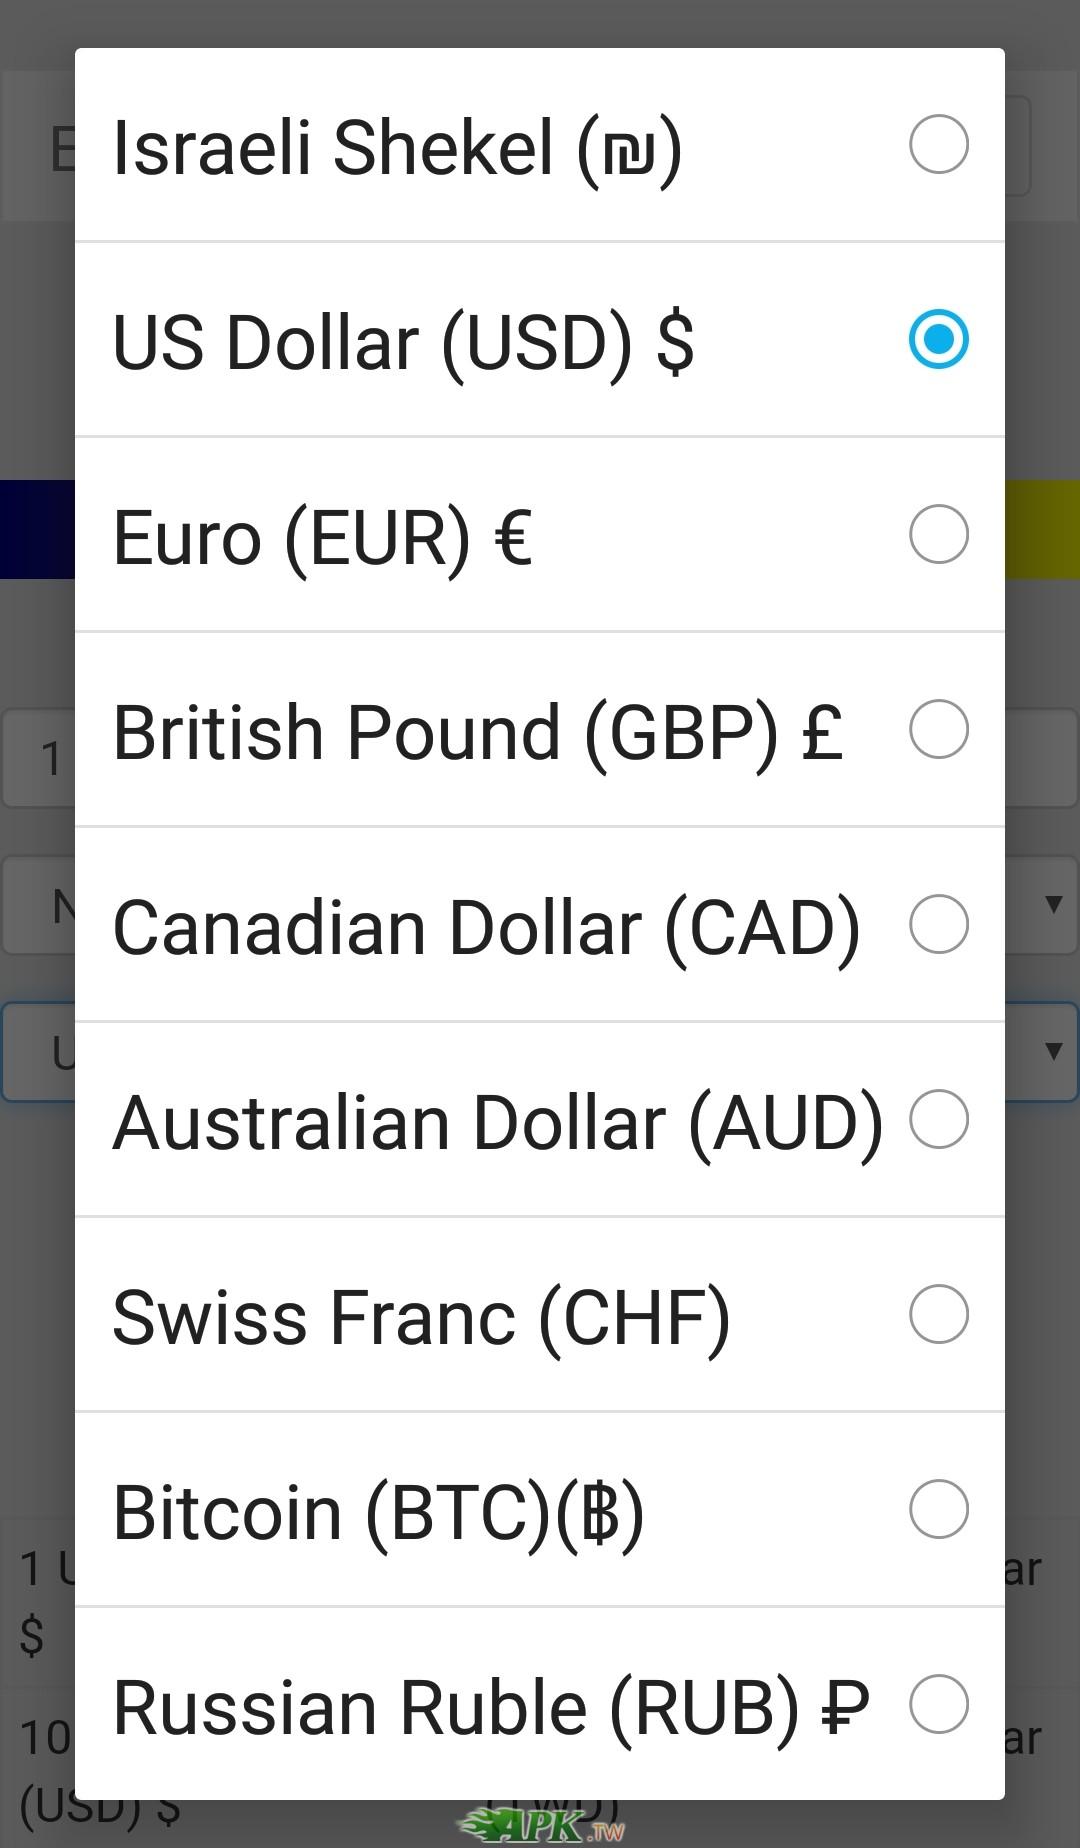 CurrencyEasilyPlus_1.4.4b121_3.jpg